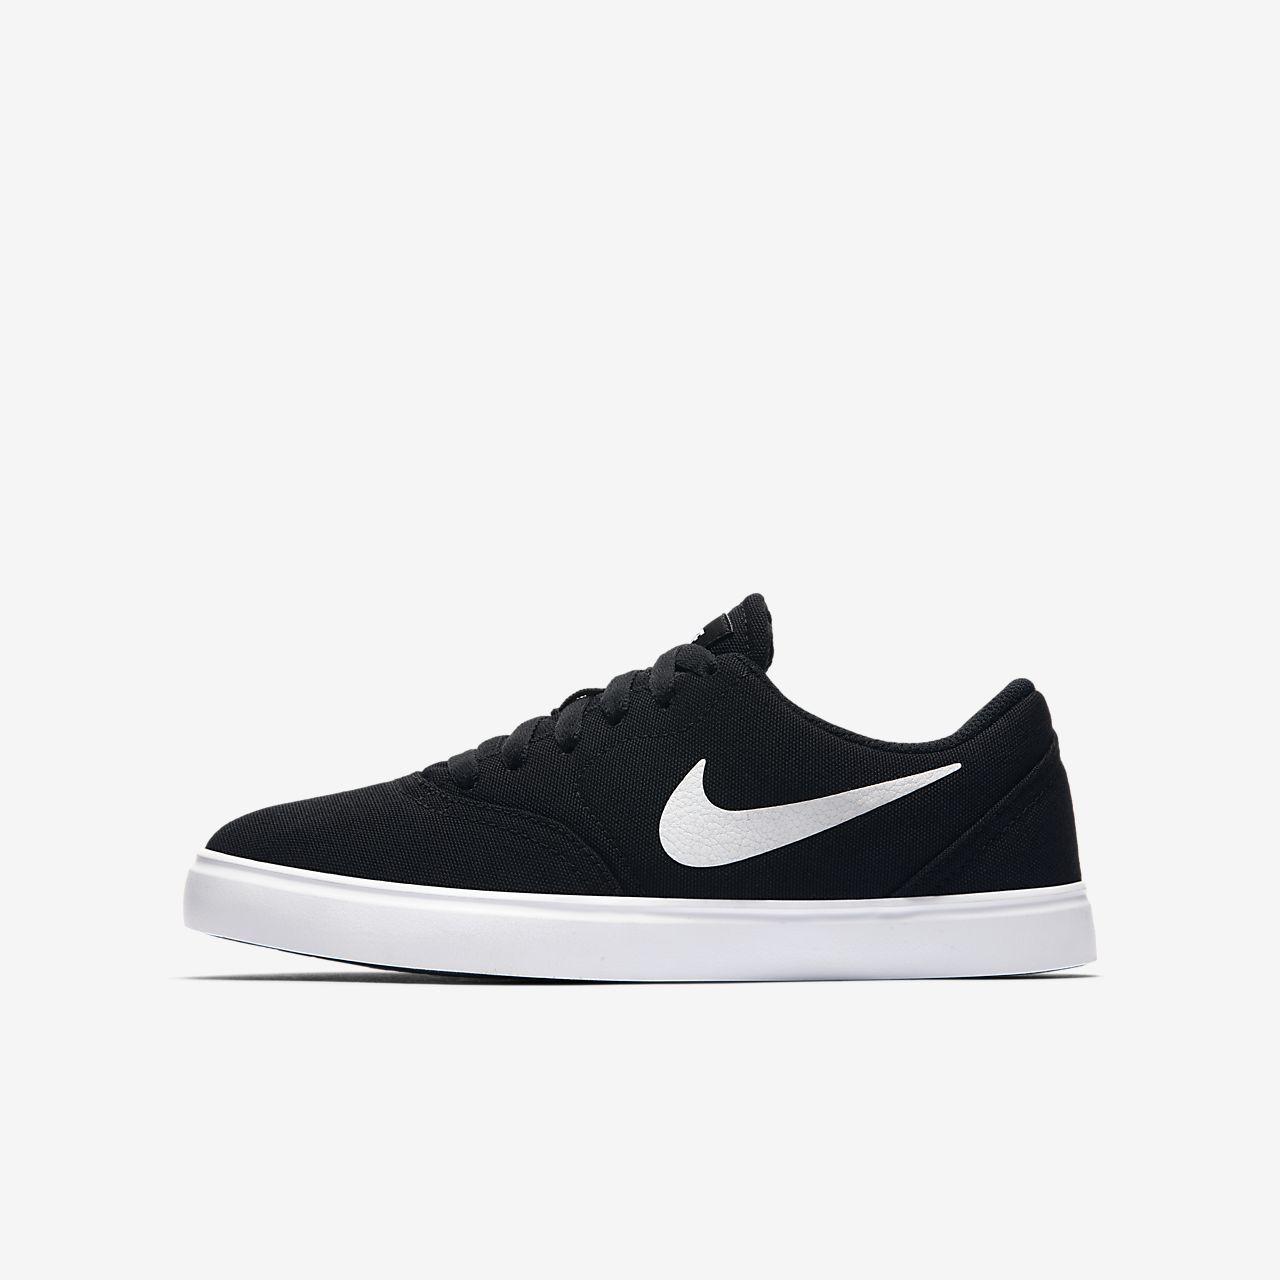 Обувь для скейтбординга для школьников Nike SB Check Canvas